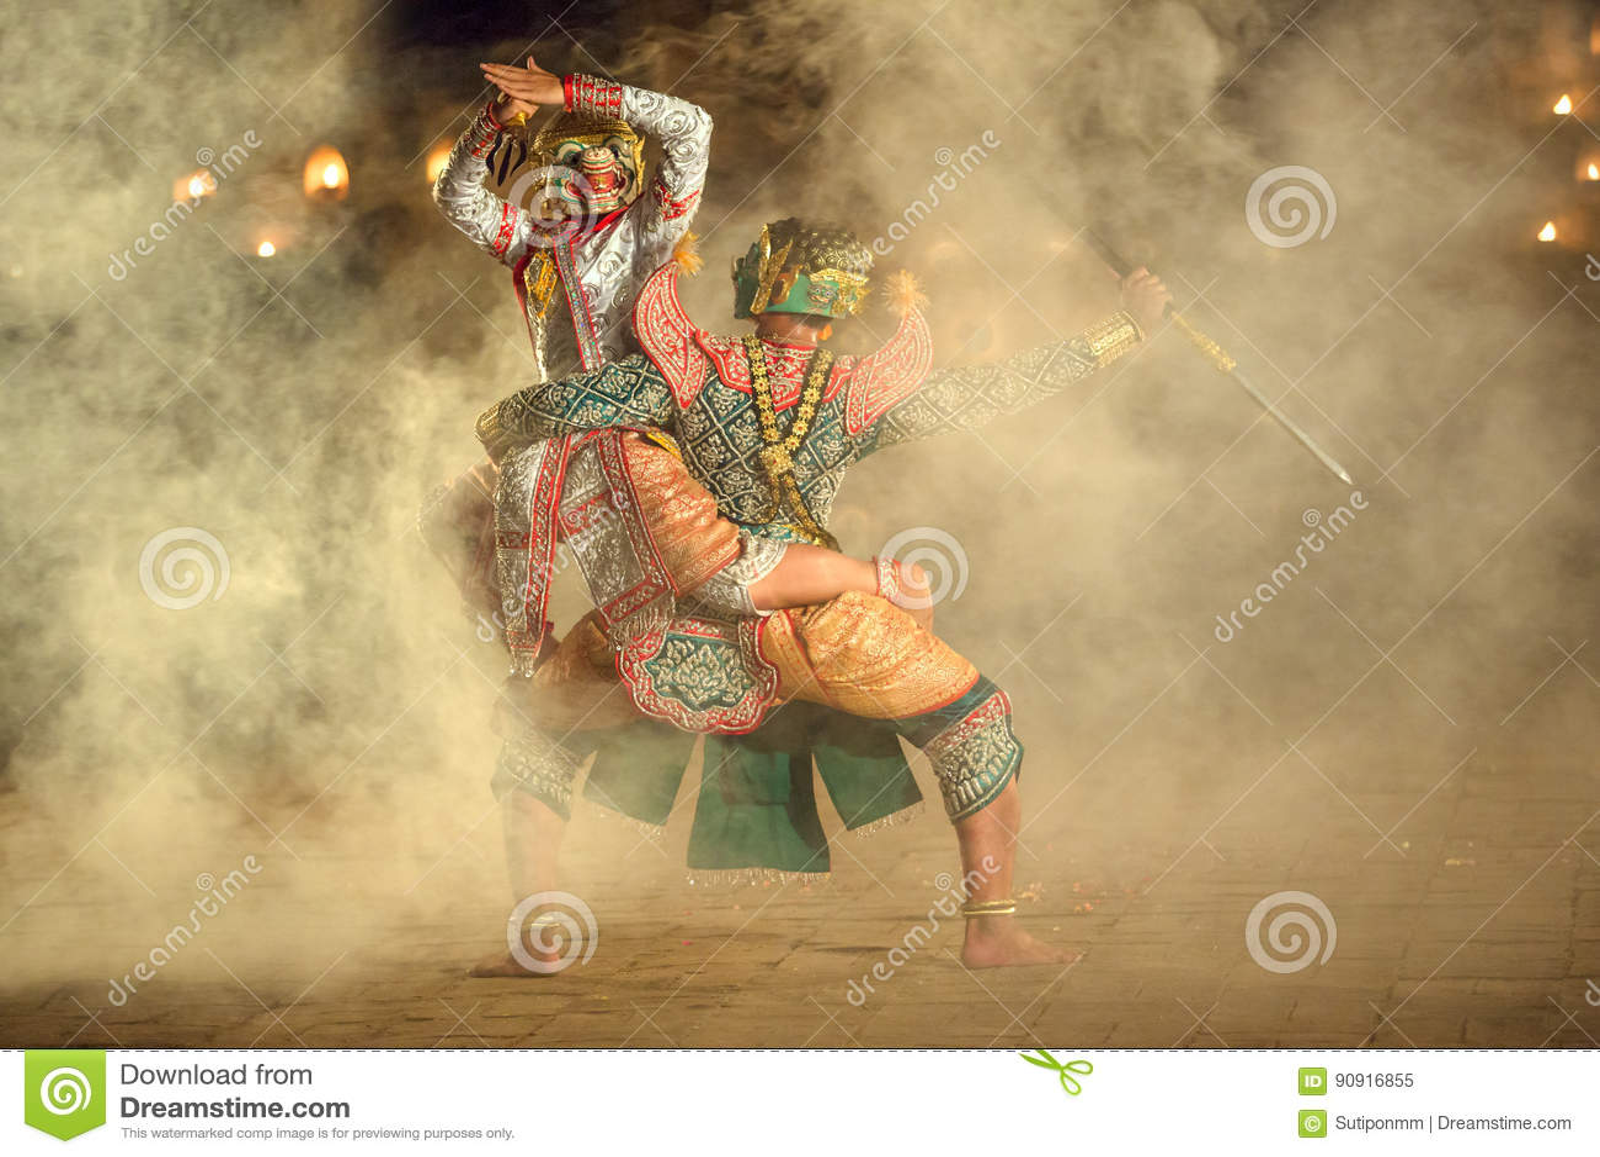 Khon tailandês o Hanuman de combate com kumarakorn no Ramayana s